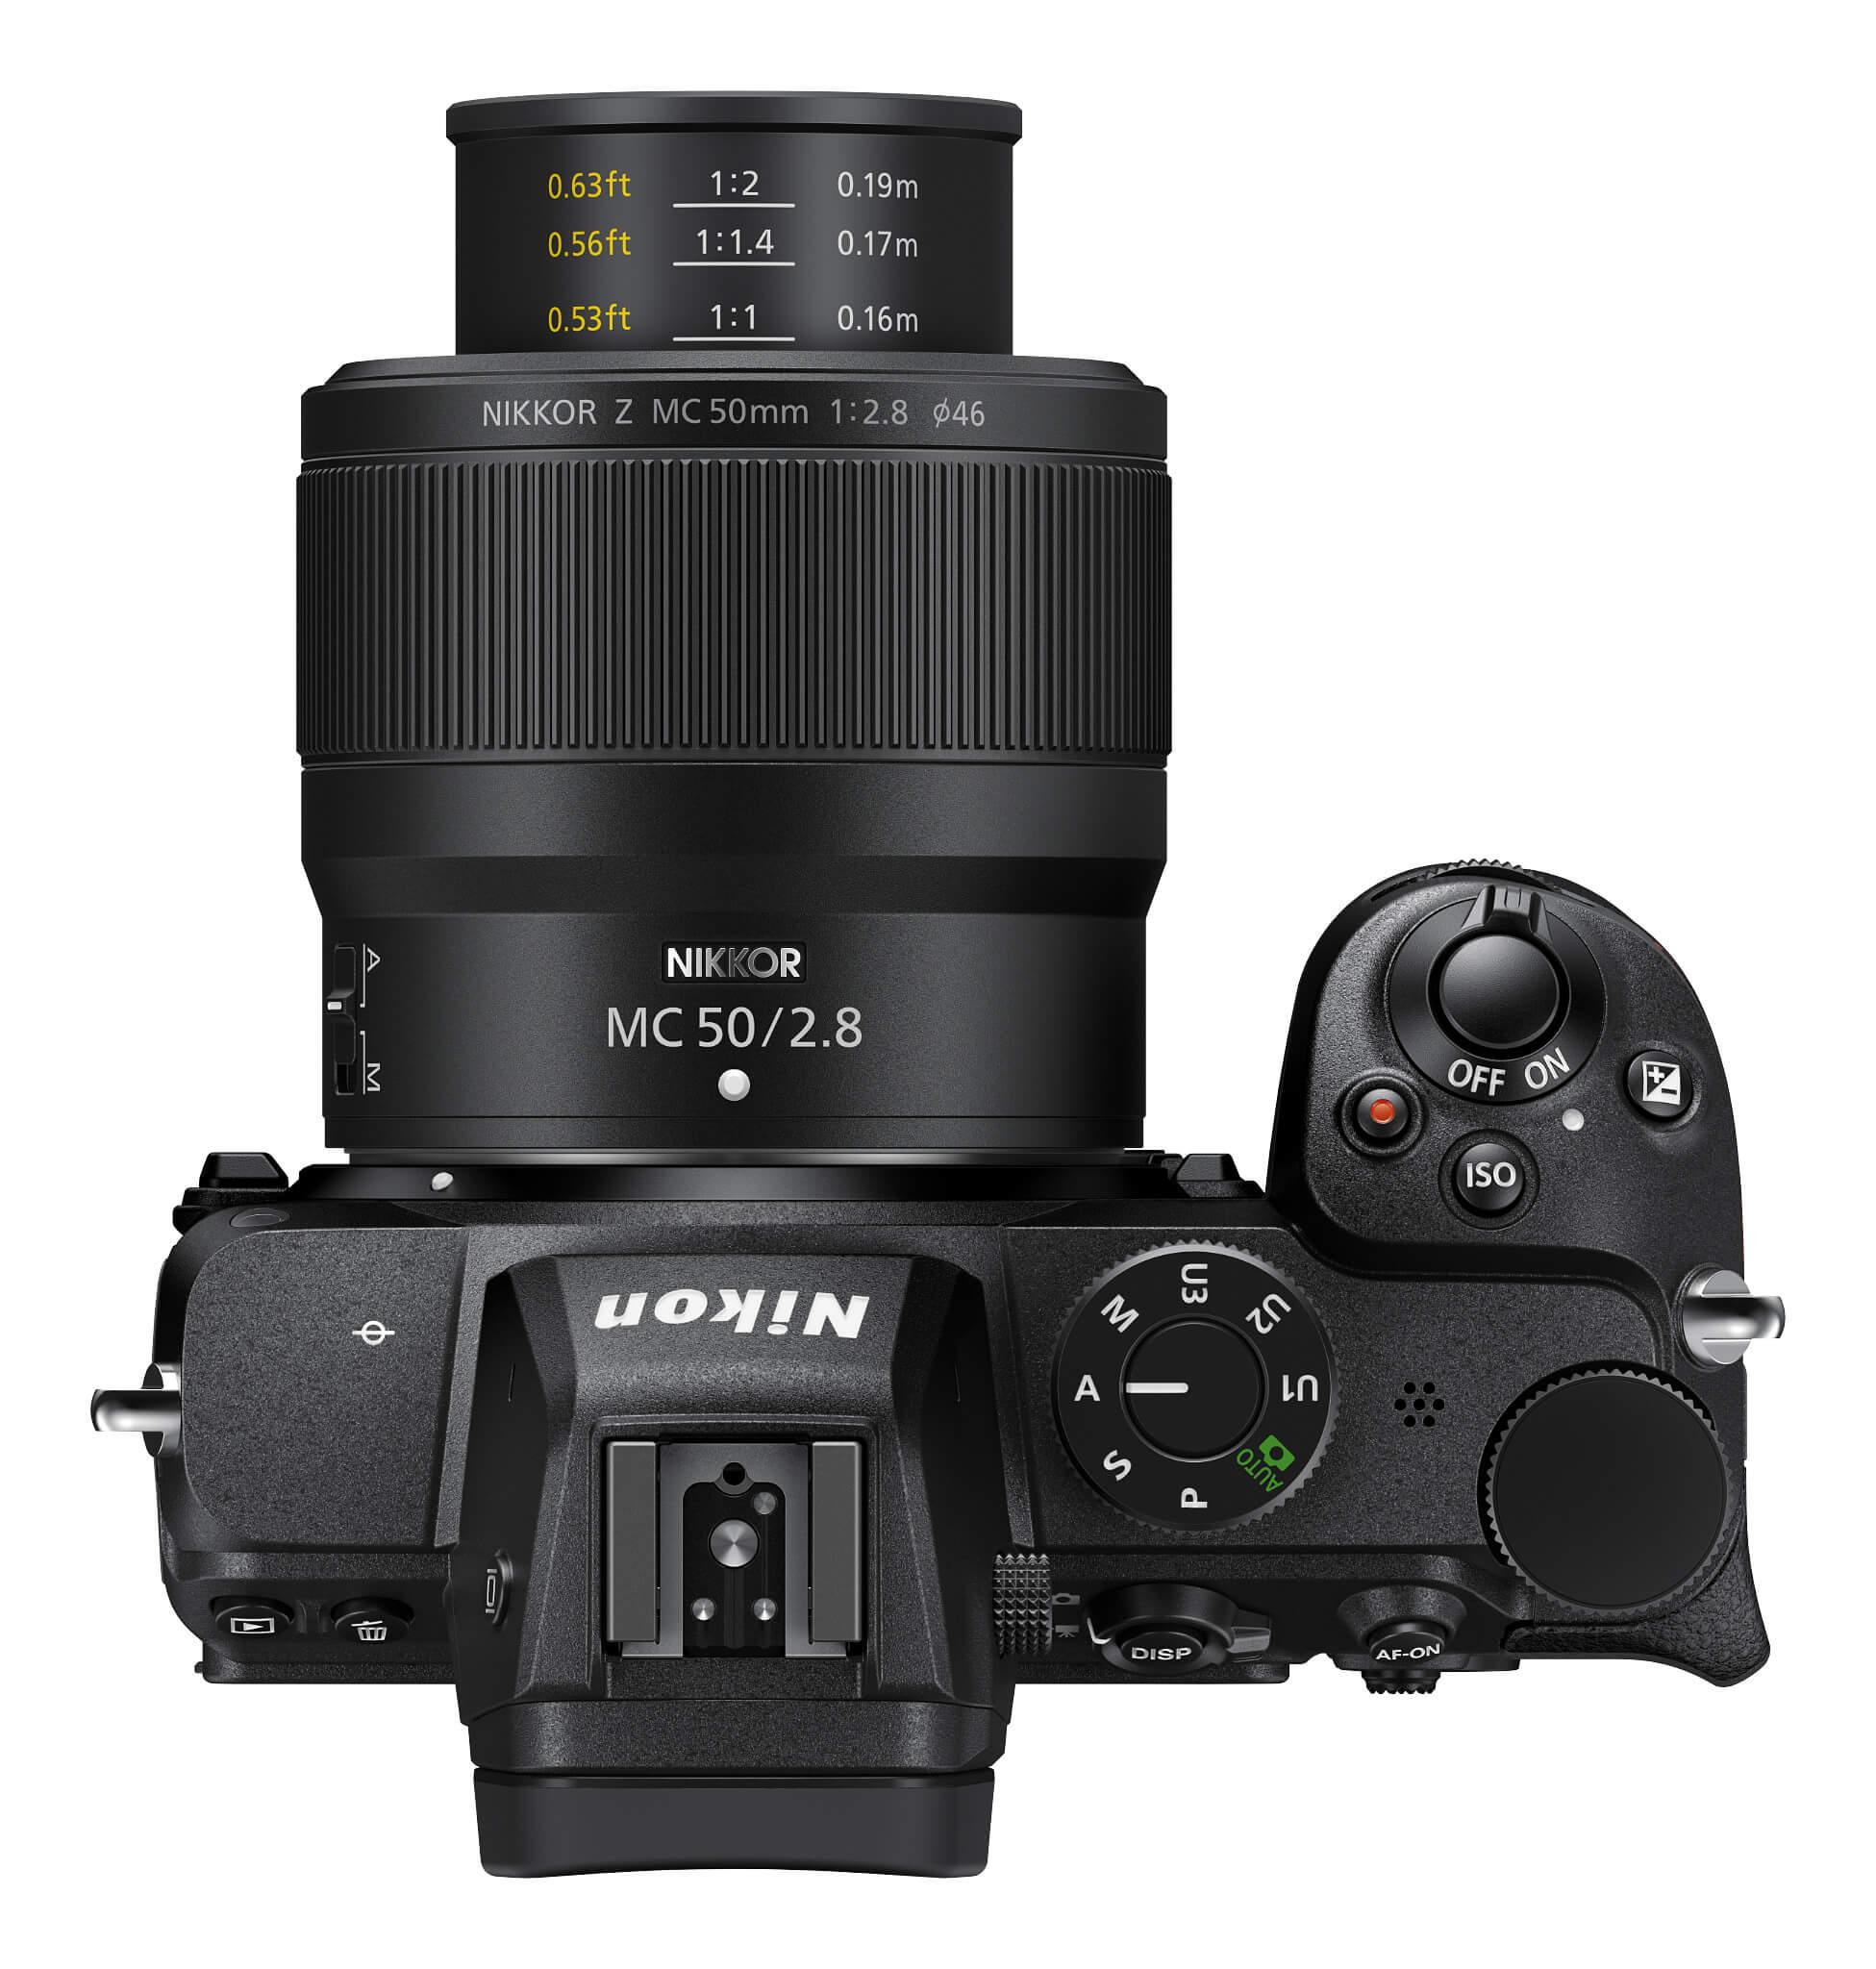 Nikkor Z MC 50 mm f/2,8 na těle Nikonu Z 5